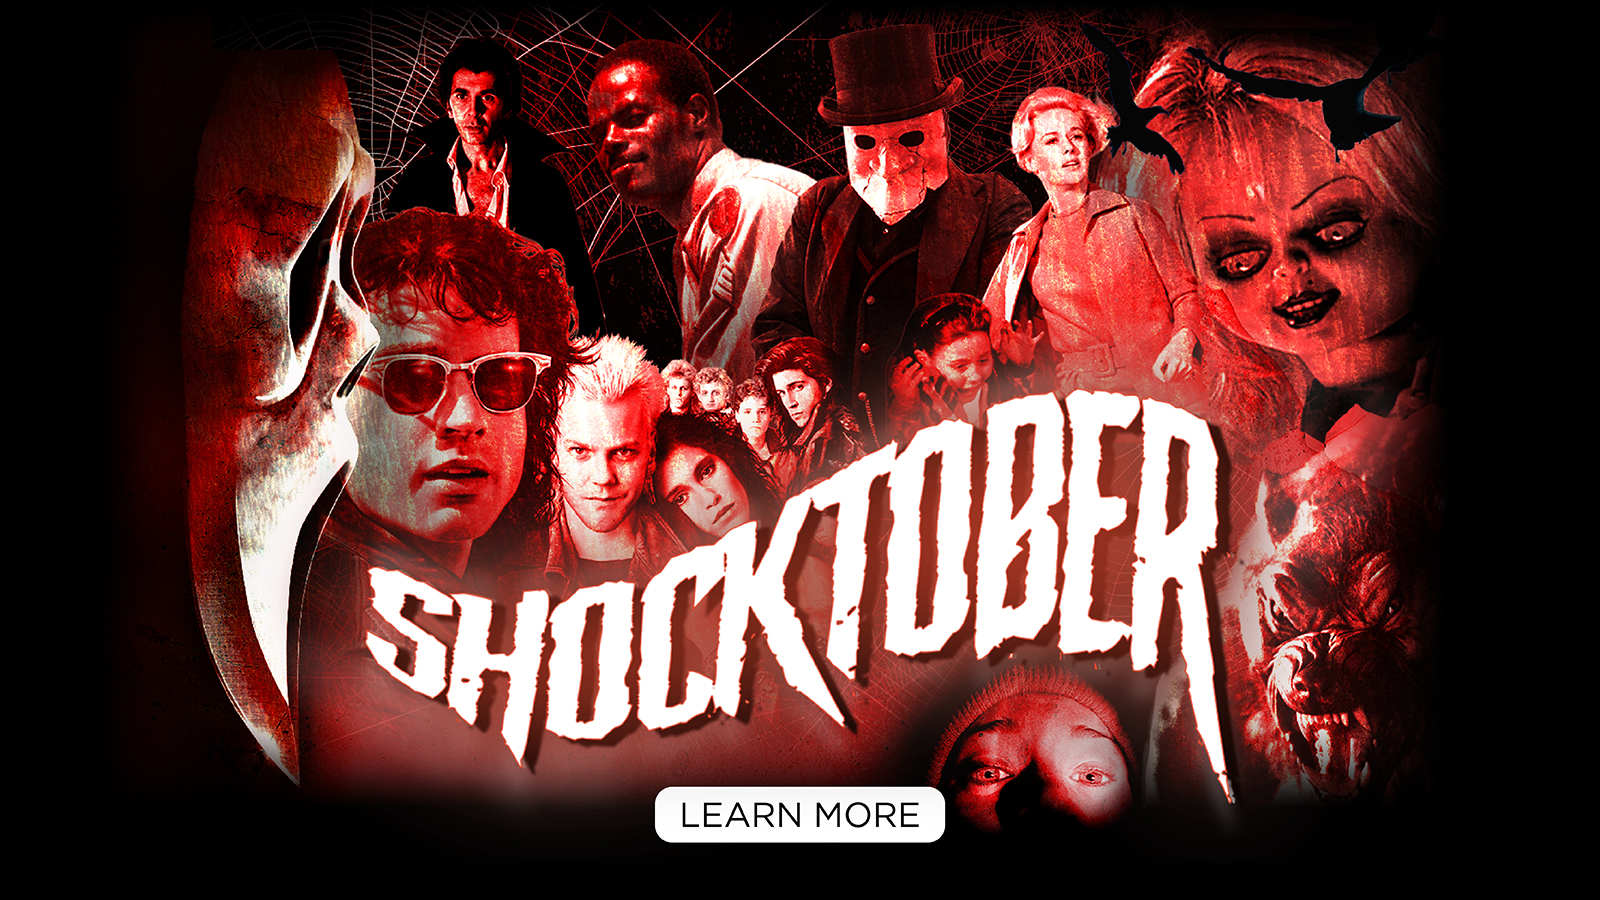 Shocktober [Learn More]